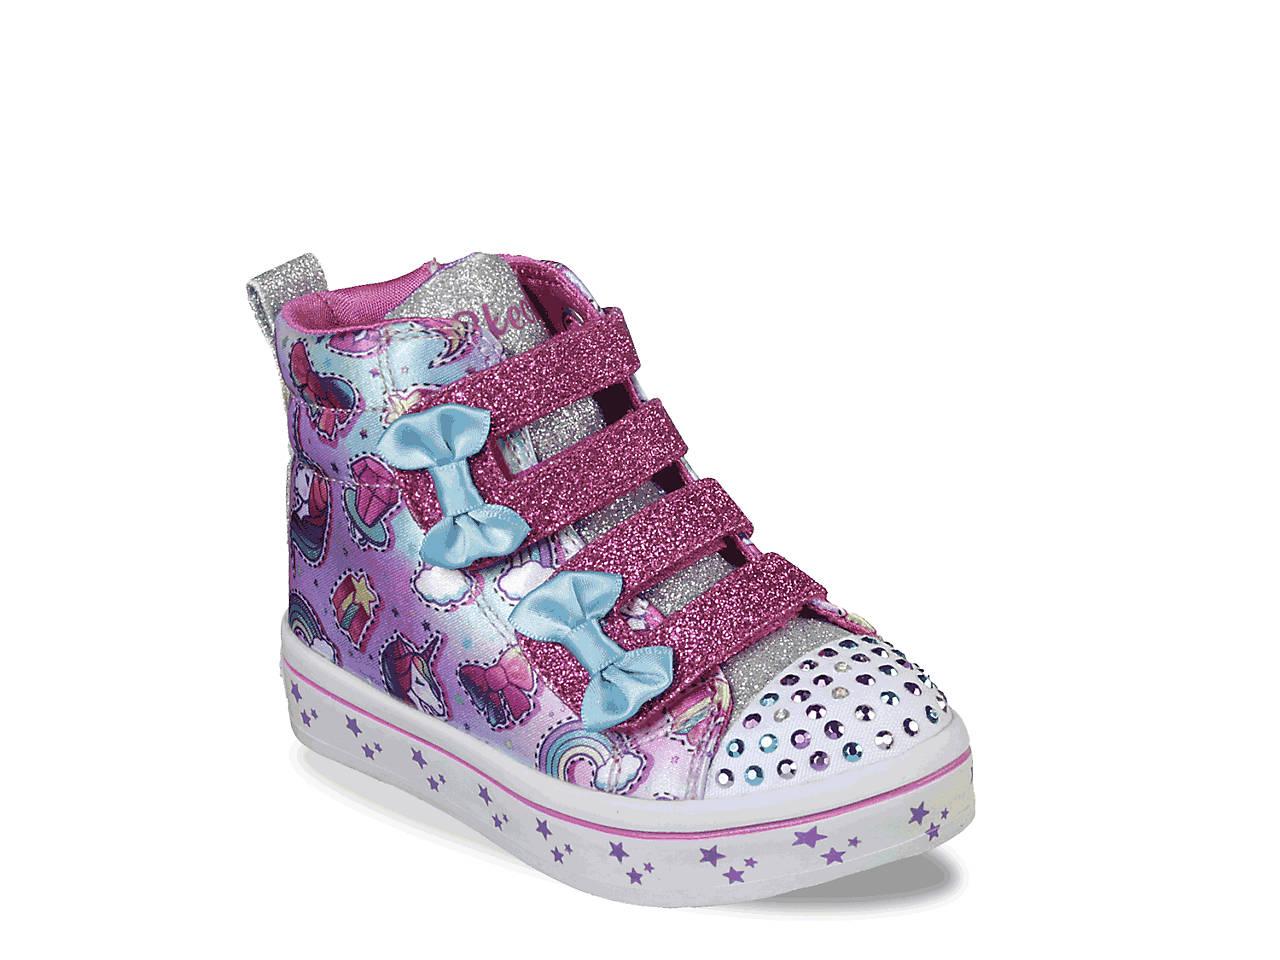 Twinkle Toes Twi Lites Mini Mojis Light Up Sneaker Kids'